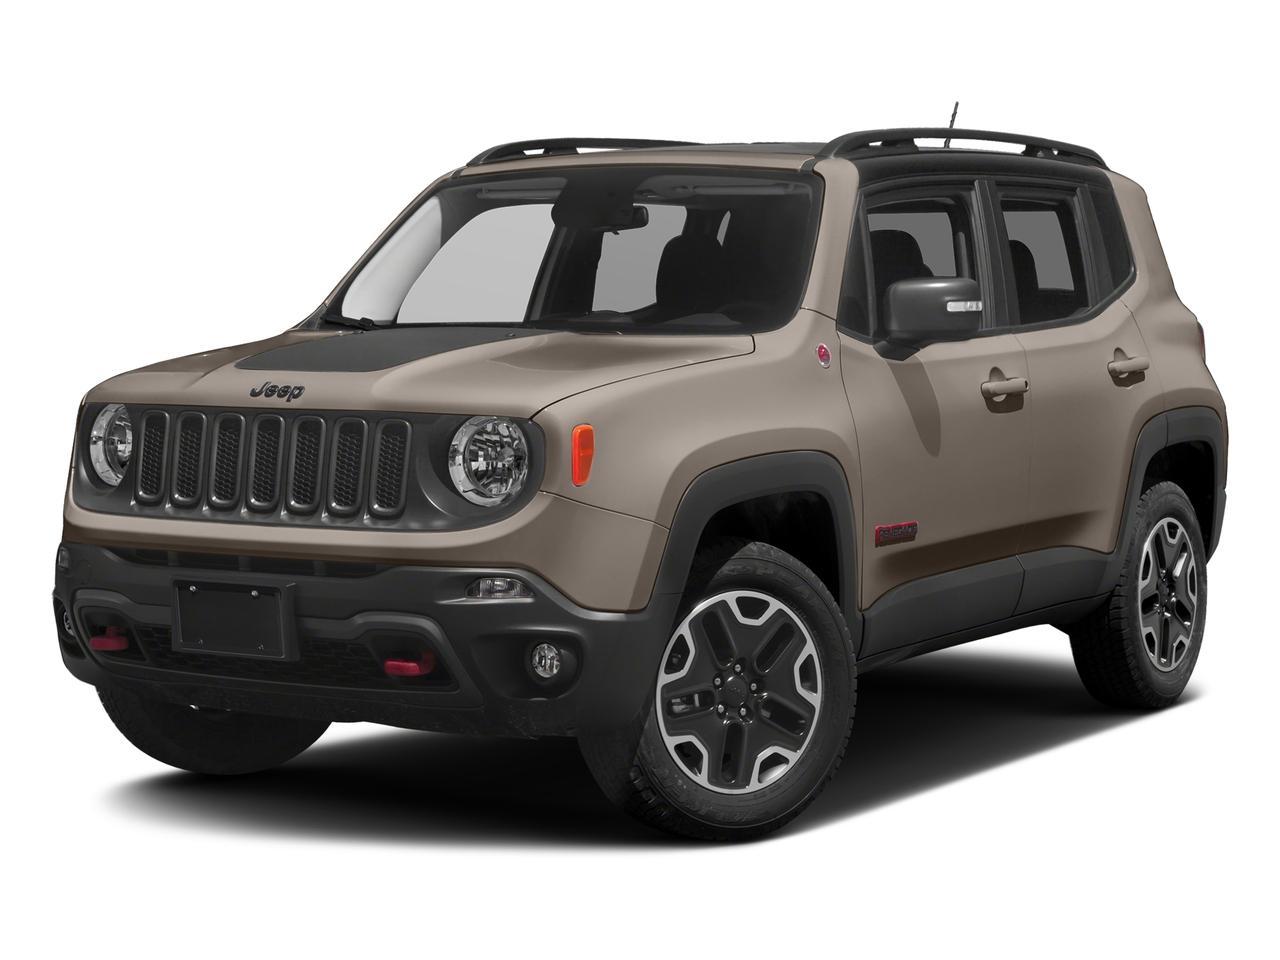 2017 Jeep Renegade Vehicle Photo in Austin, TX 78759